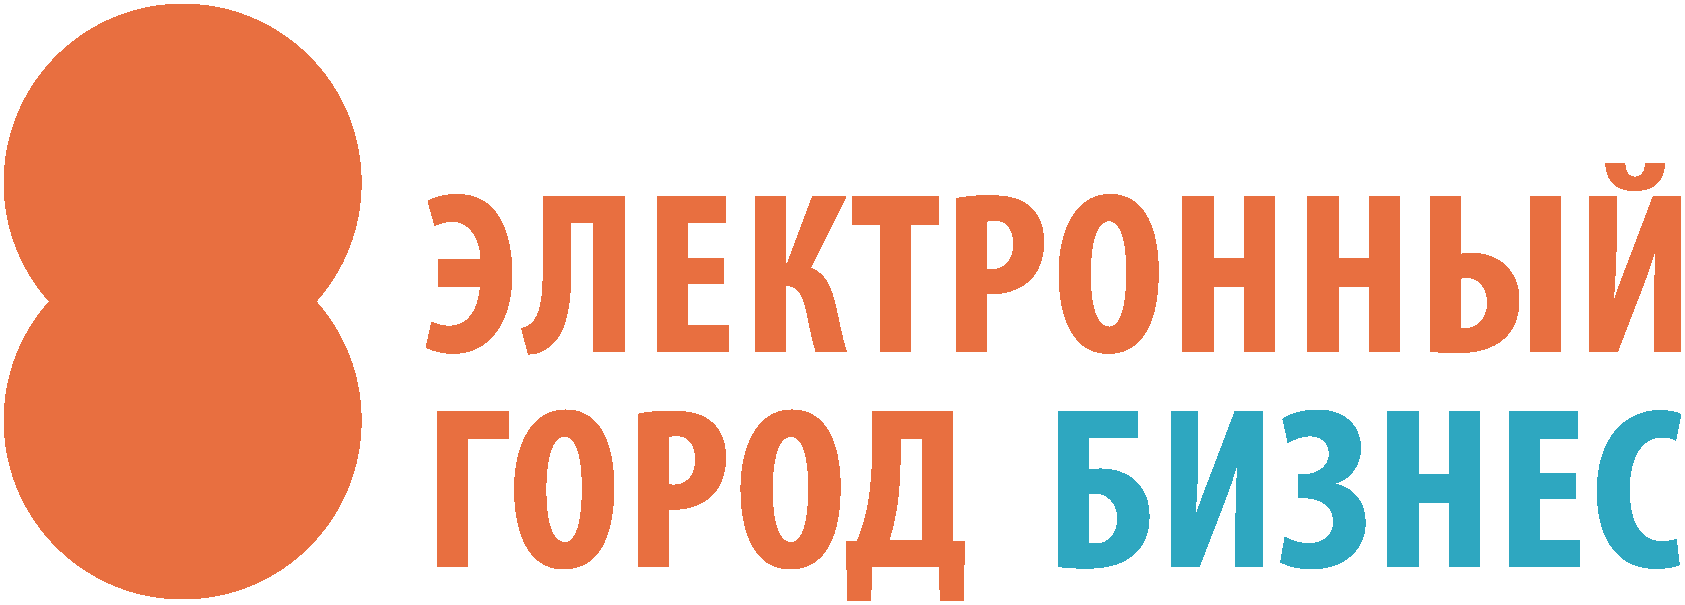 Электронный город Бизнес